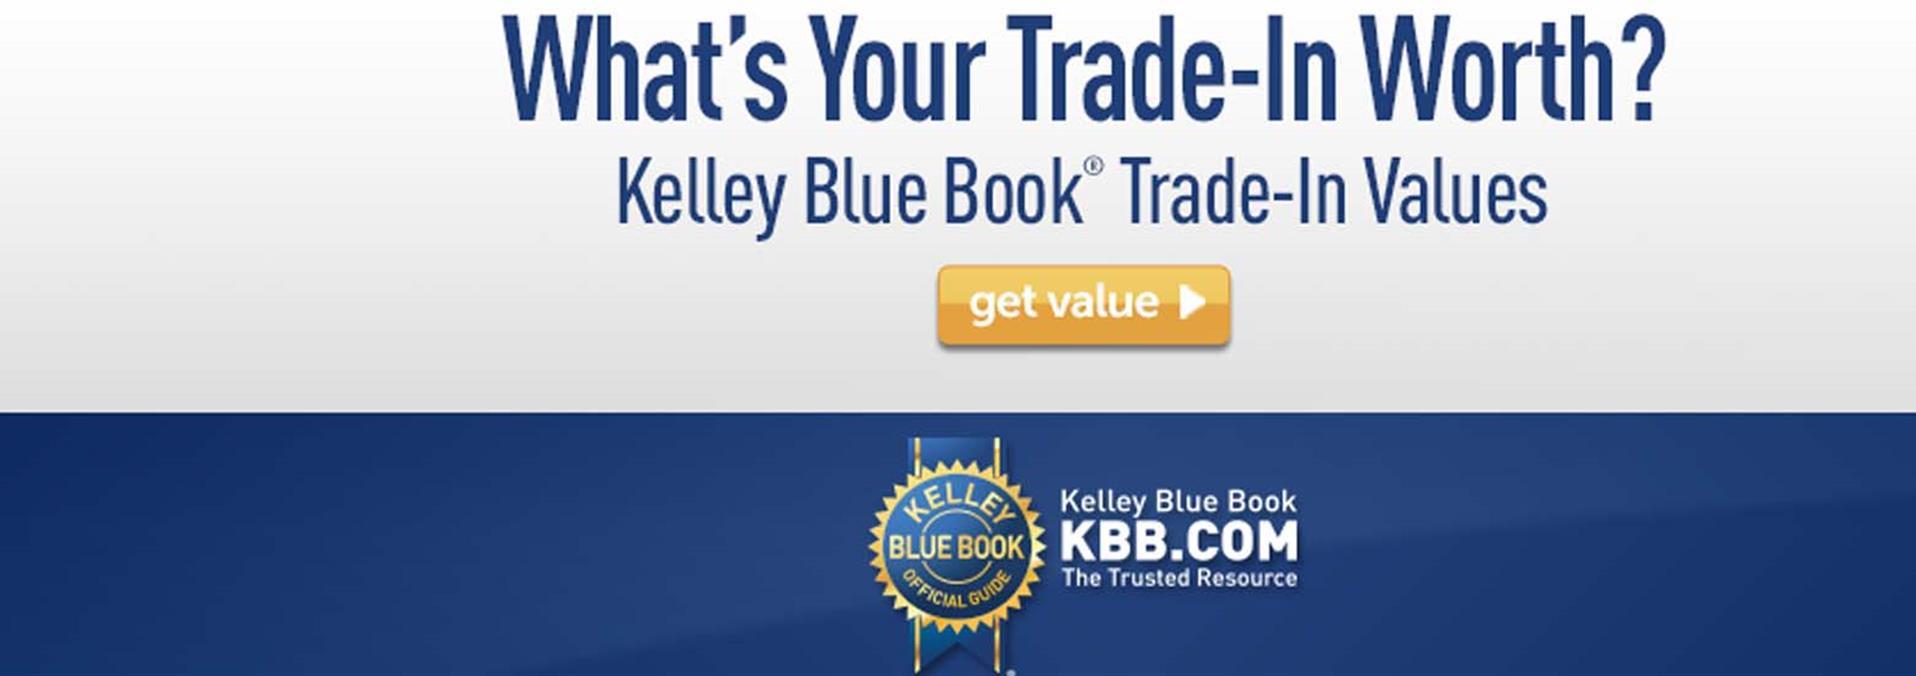 USA 1 Auto Sales Brooklyn NY | New & Used Cars Trucks Sales & Service